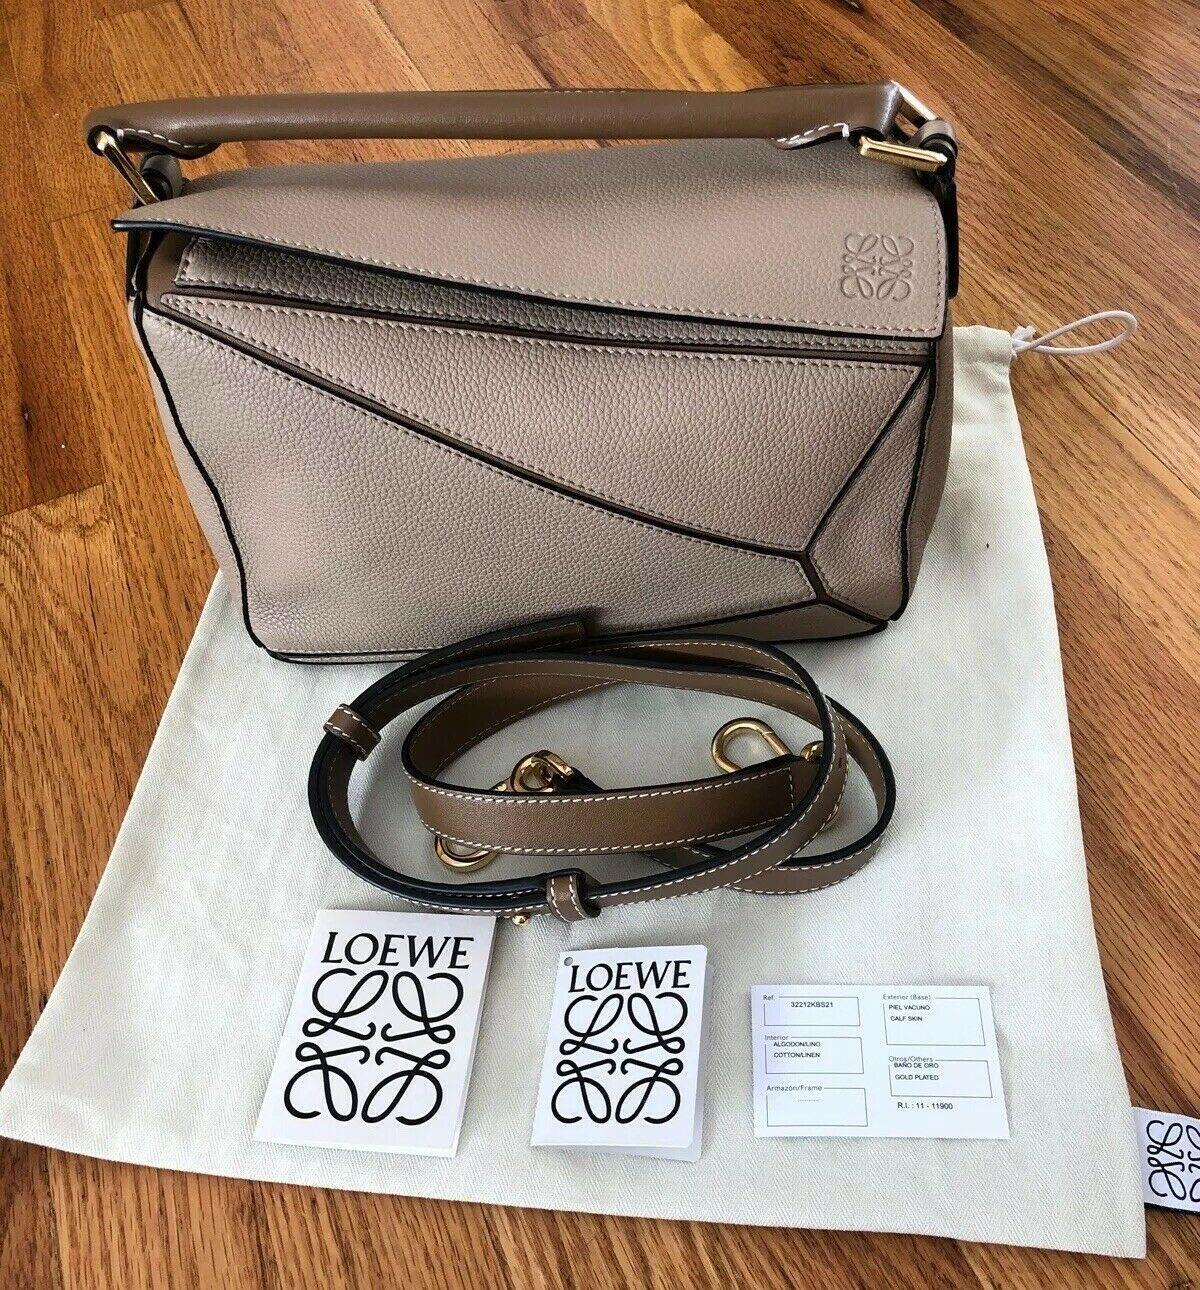 NWT Loewe Small Puzzle Satchel Crossbody Shoulder Bag Purse Sand Mink Tan Brown 8432902463249   eBay